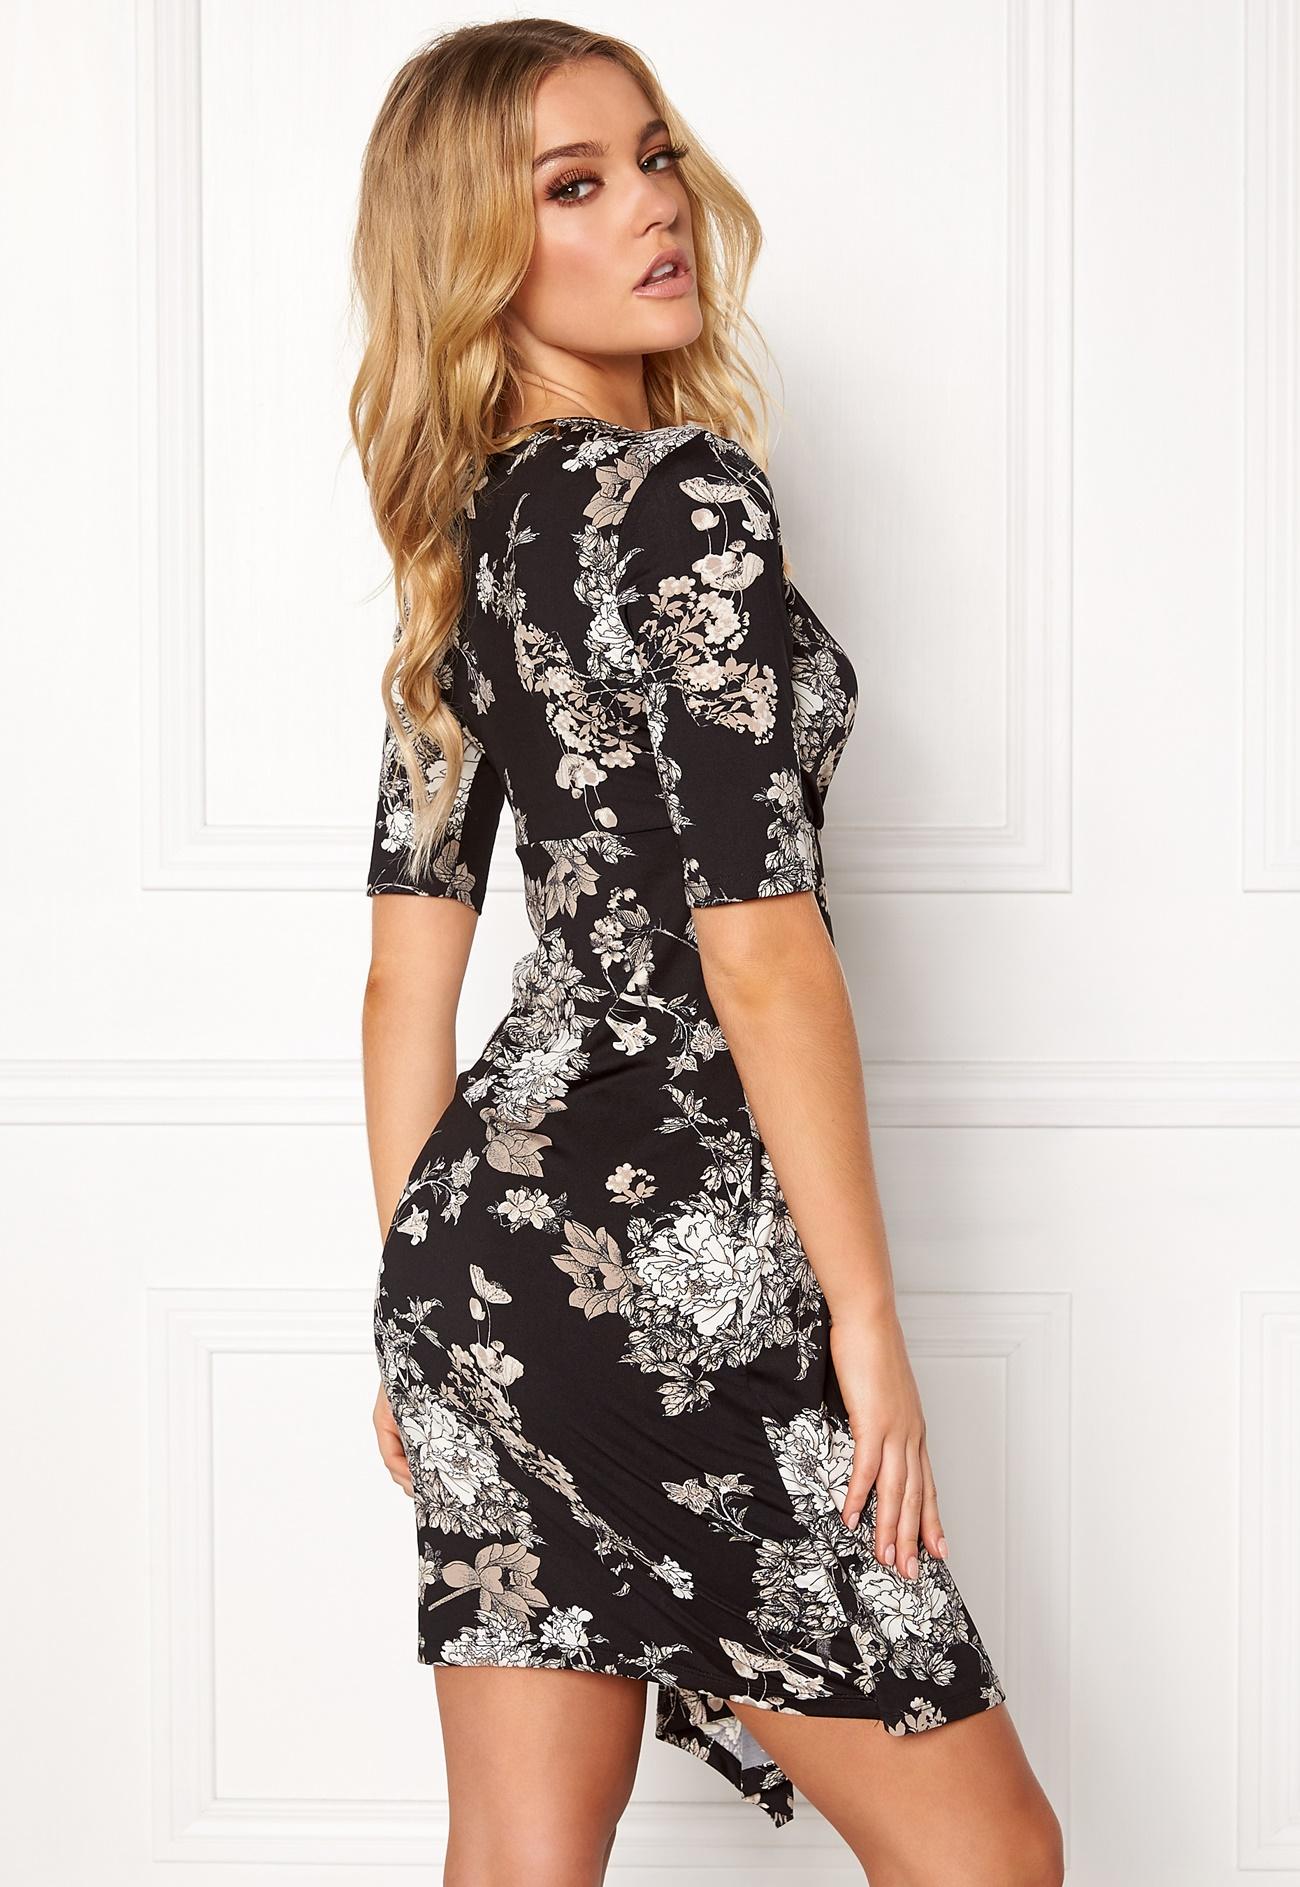 Sexiga Kläder Online Sexig Klänningar